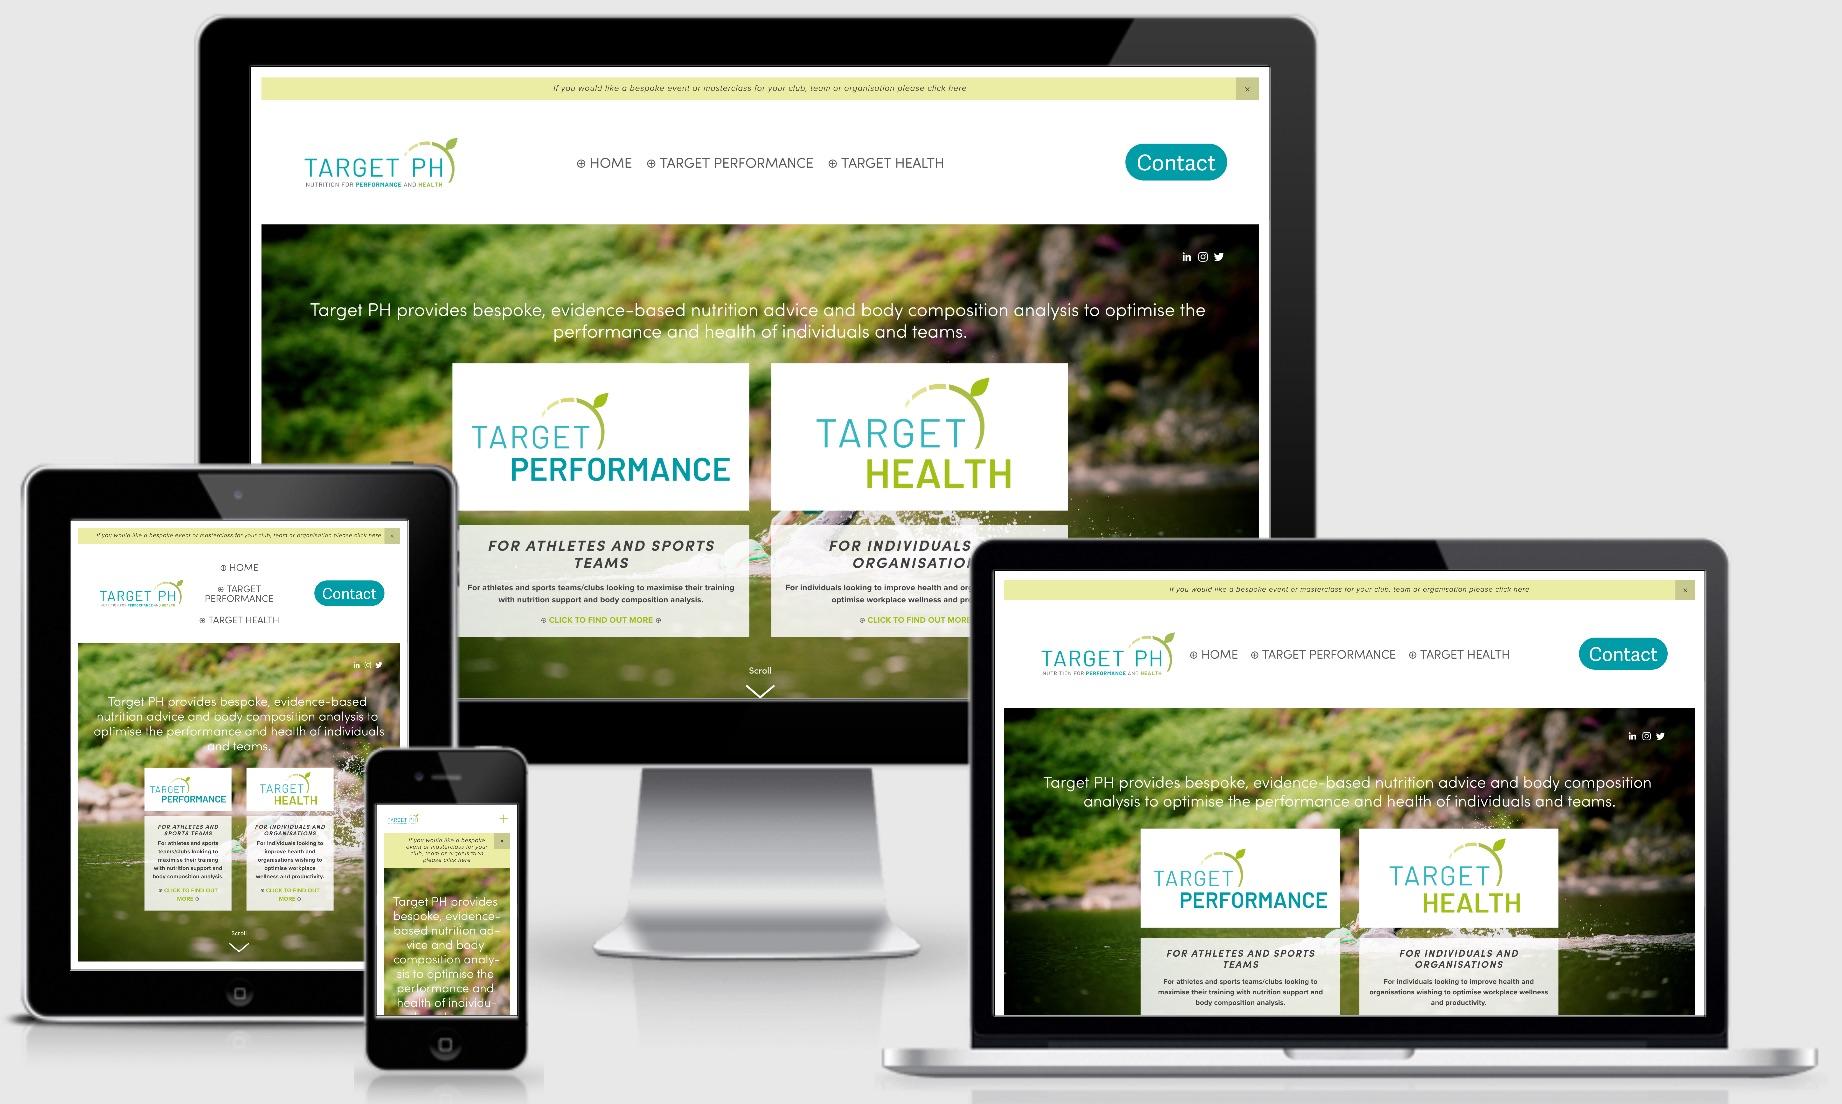 targetph.com website visual 1 Ravenspoint Marketing copy.jpg